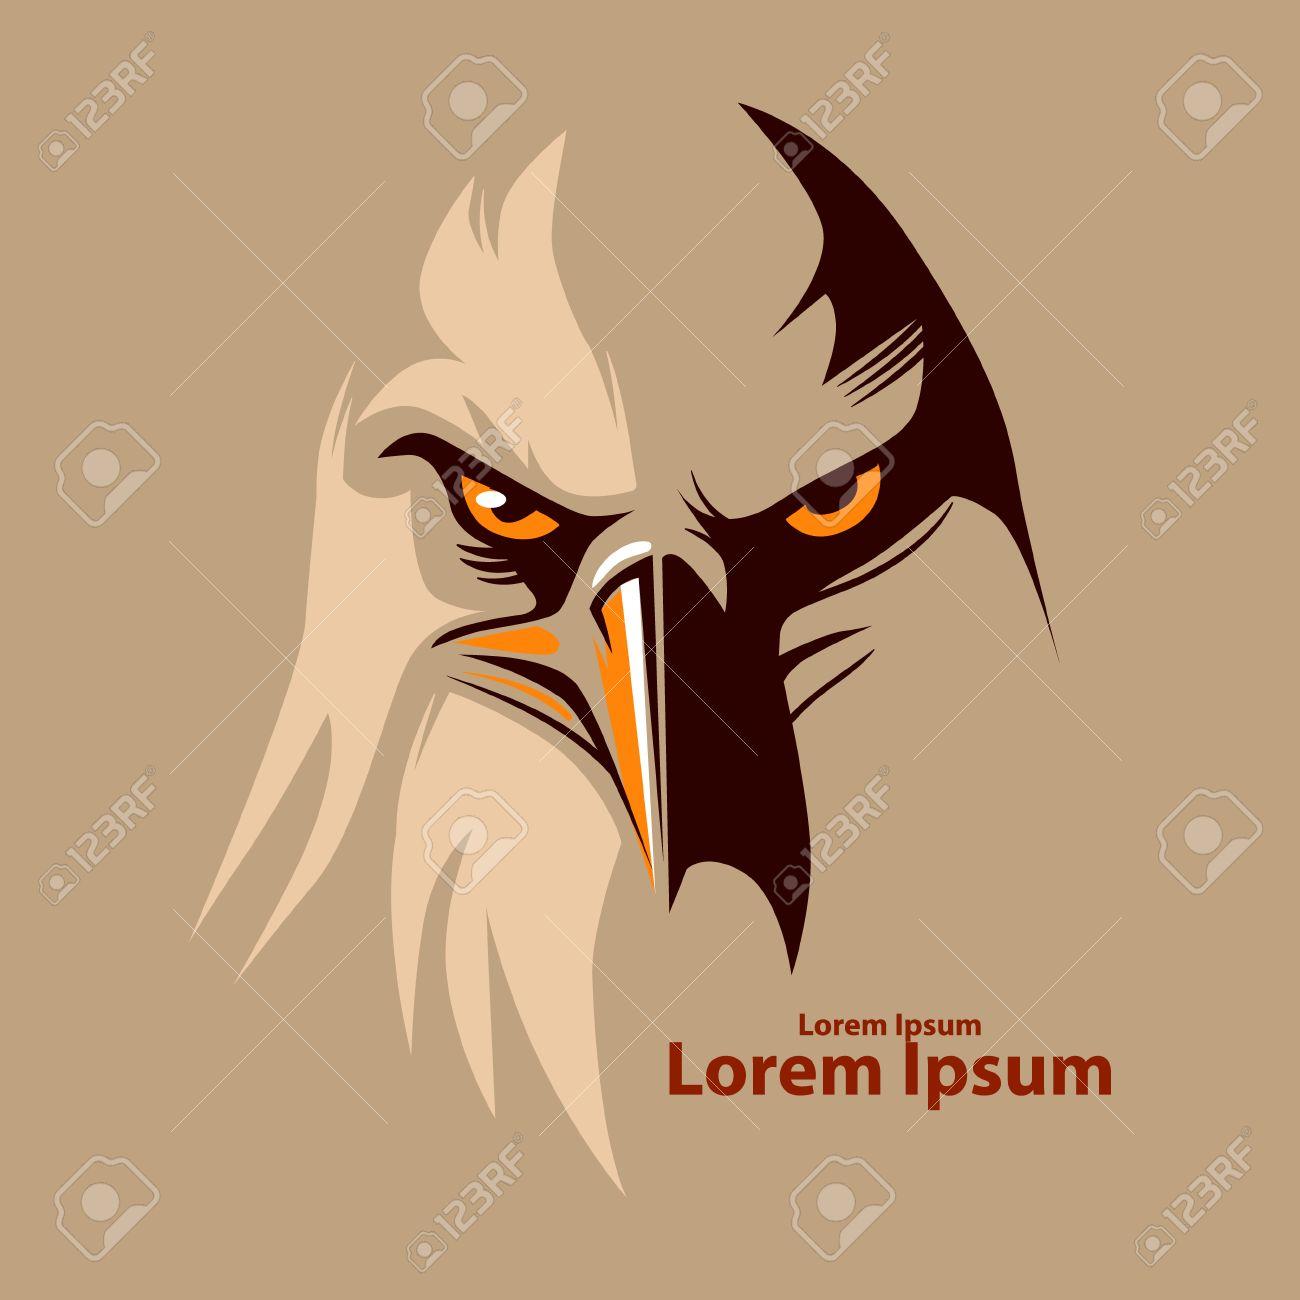 eagle head for logo, american symbol, simple illustration - 52813152